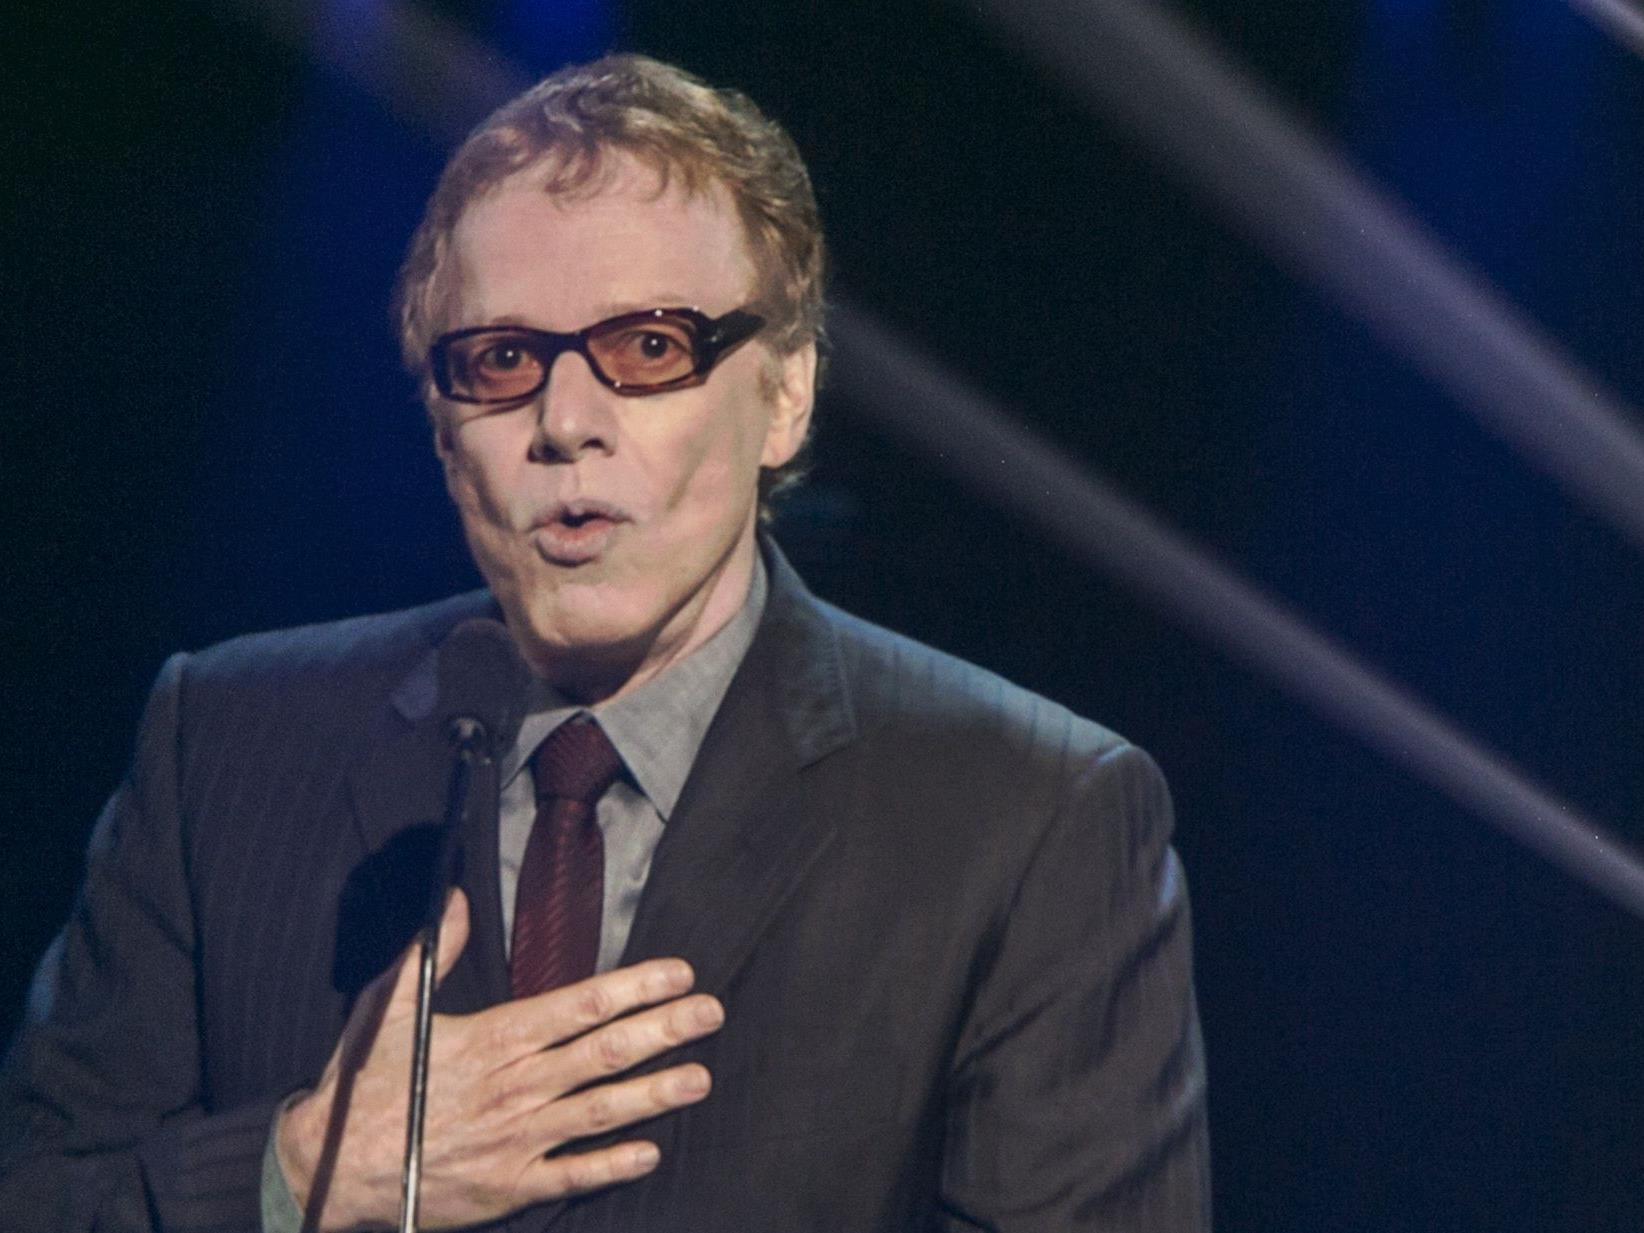 Danny Elfman erhält bei Gala am 29. September den Max Steiner Film Award